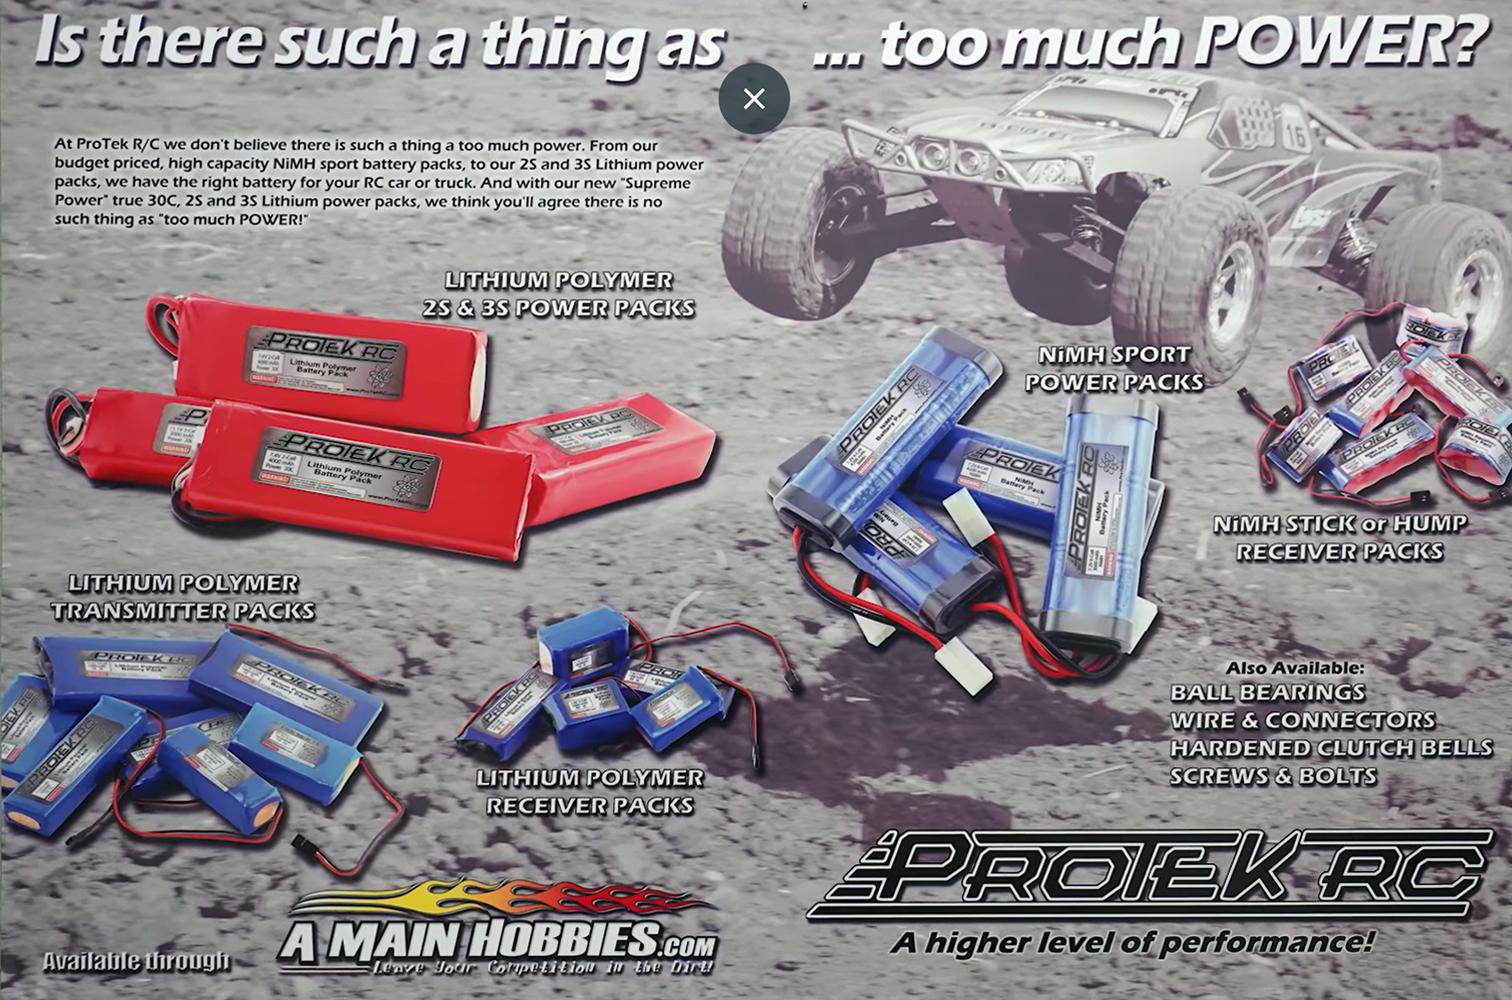 Retro ProTek RC Advertisement